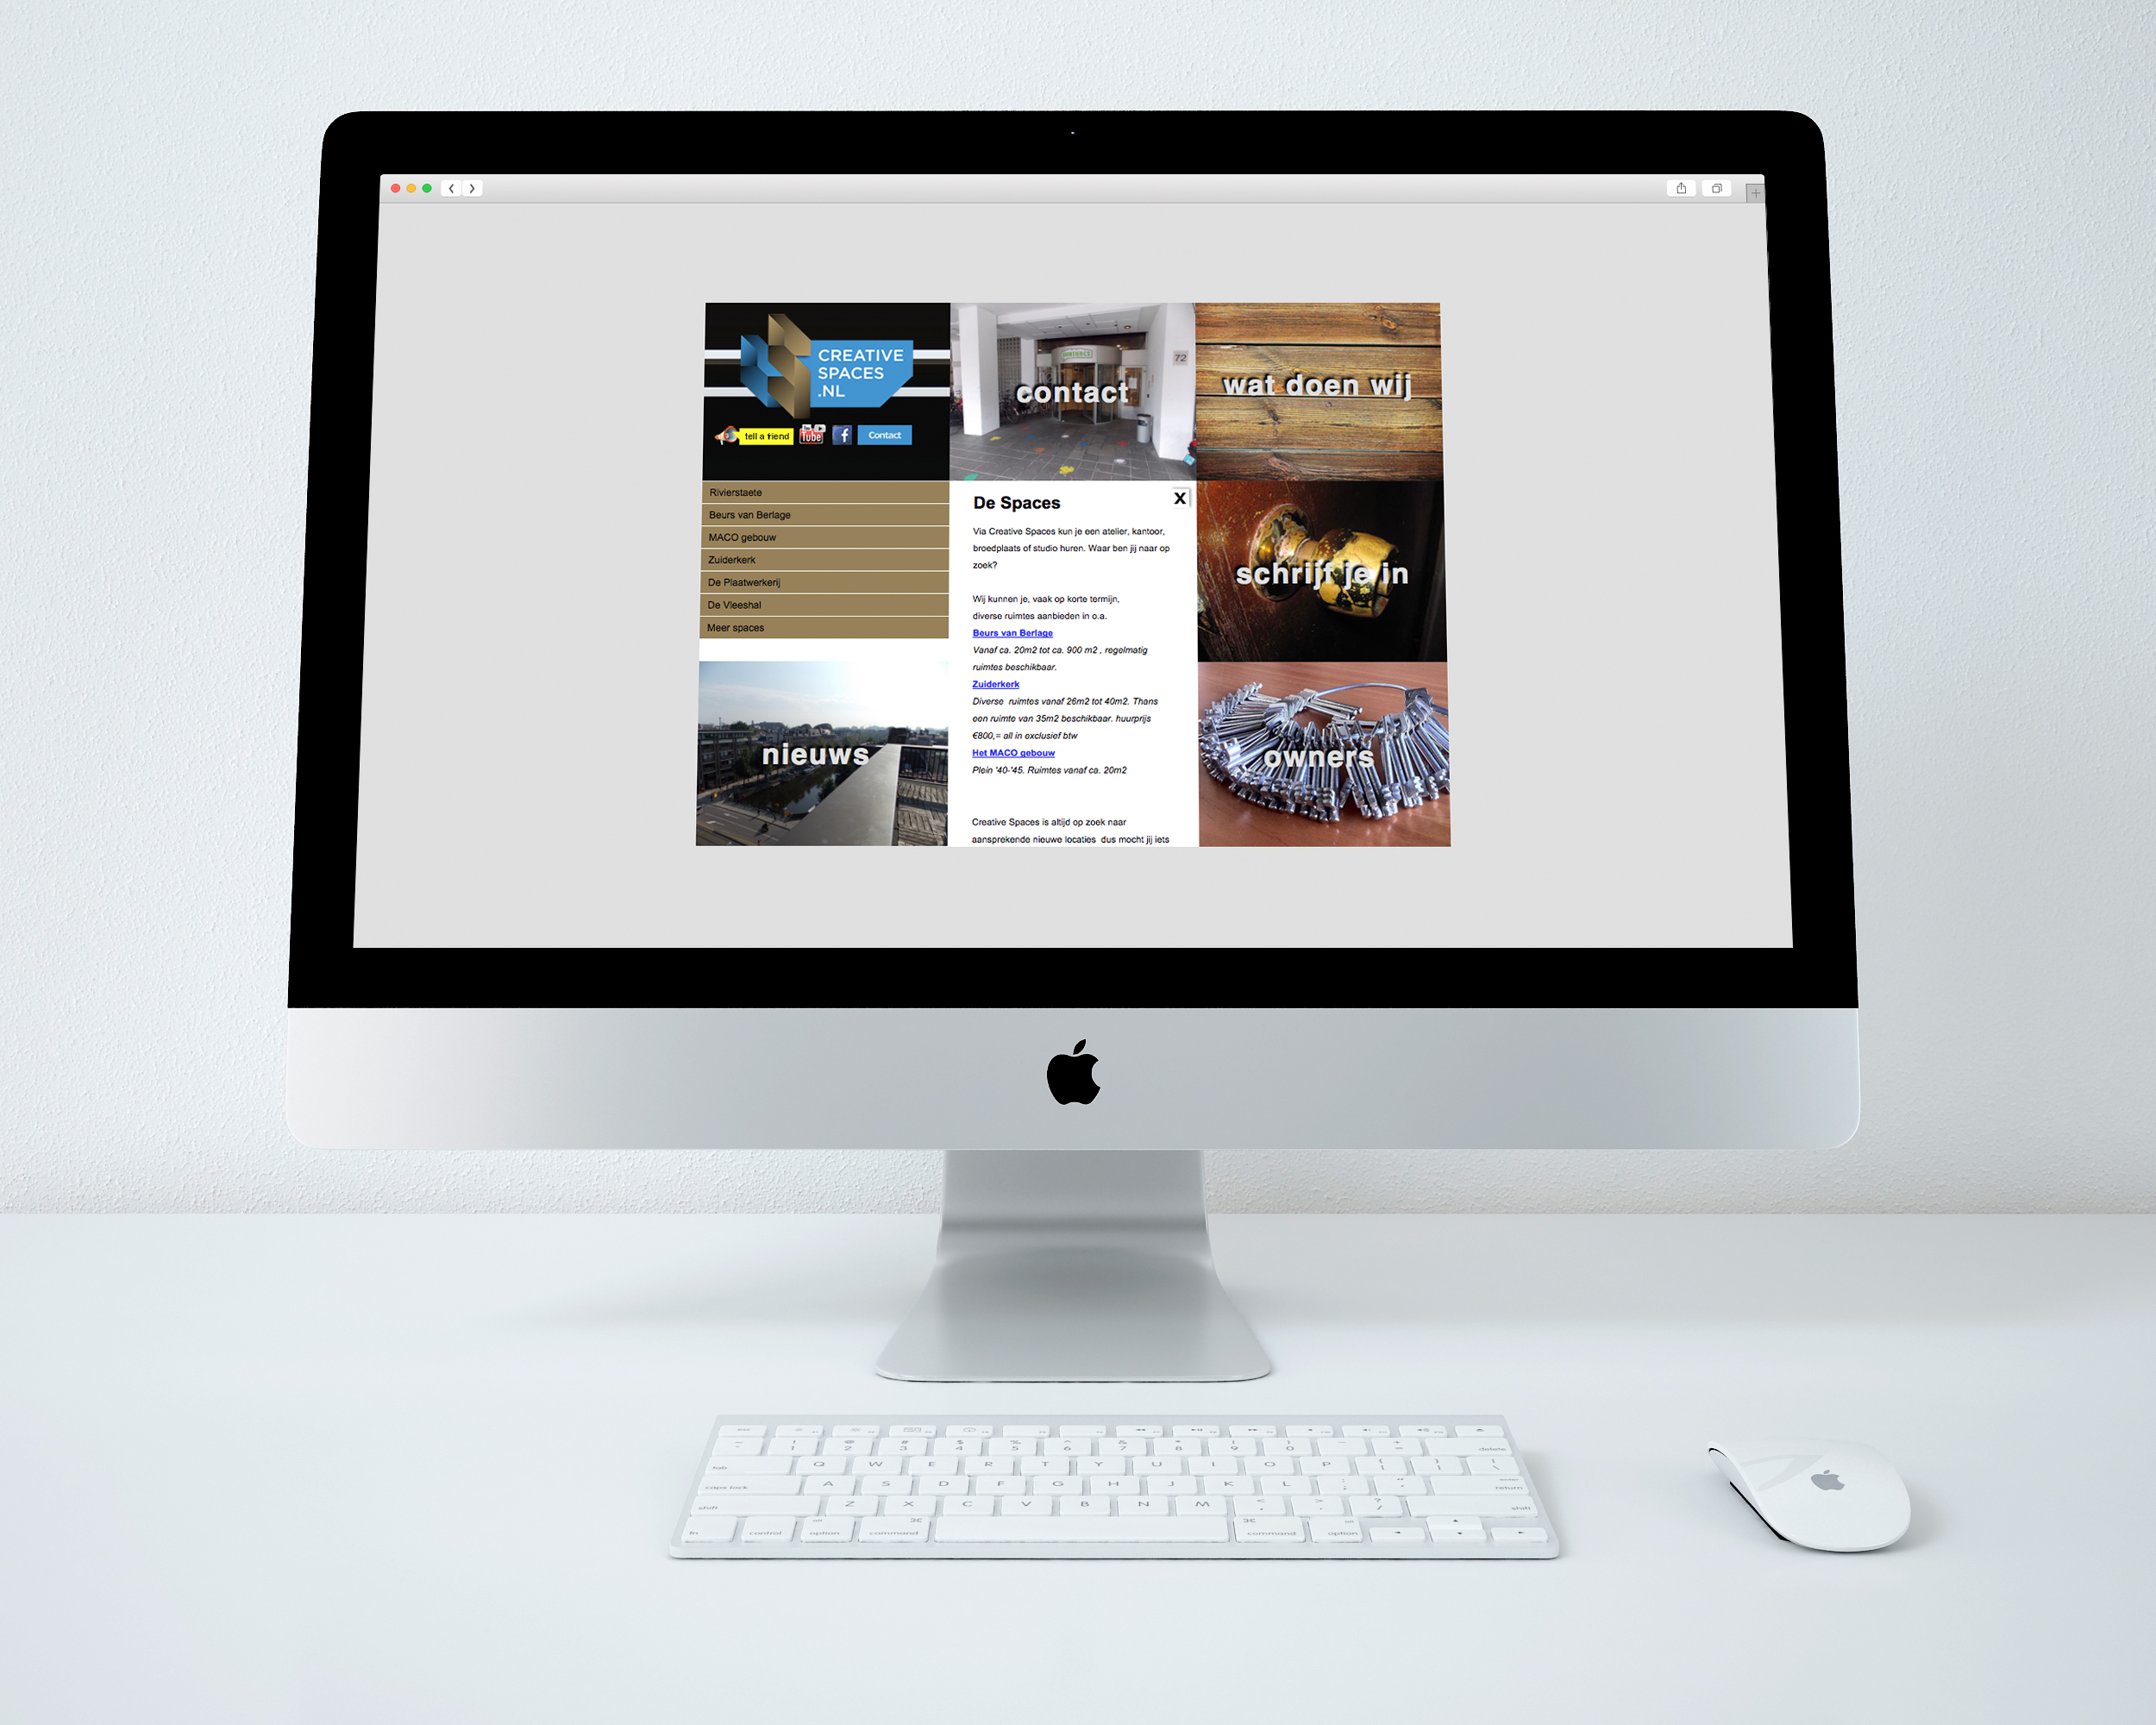 Creative_Spaces_Website_Green_Creatives_04